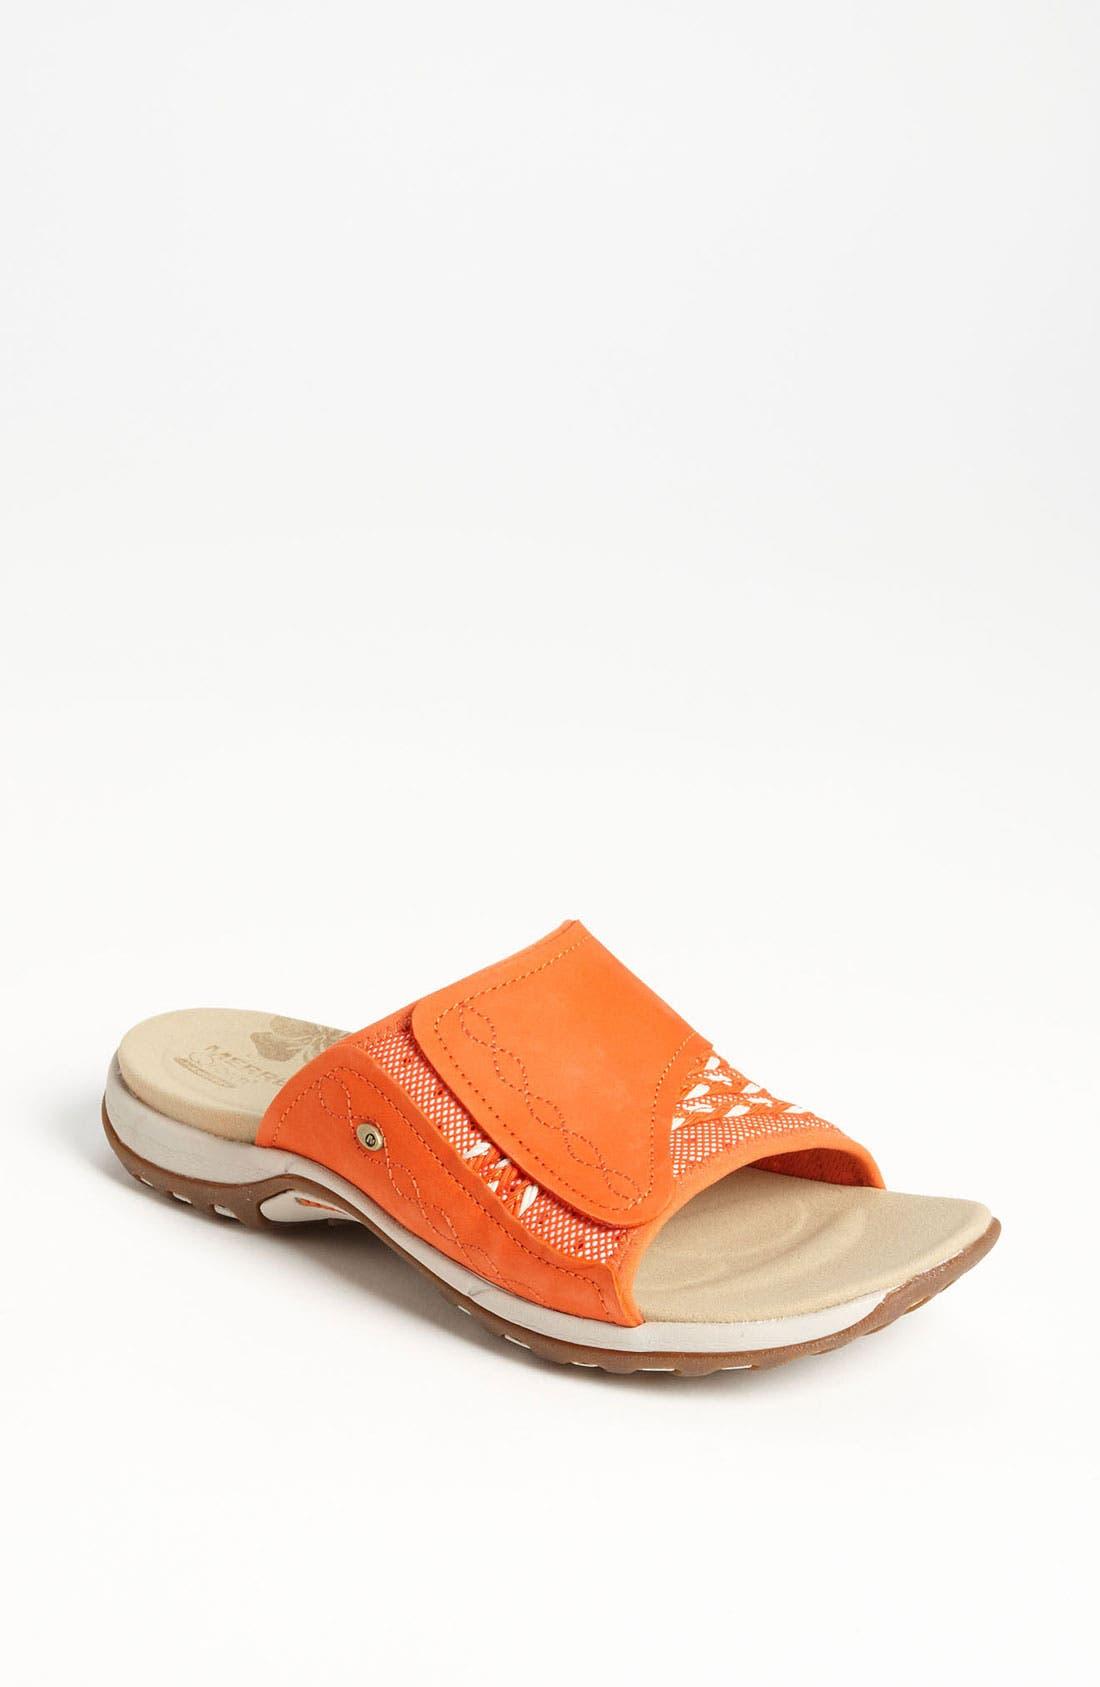 Main Image - Merrell 'Lilyfern' Sandal